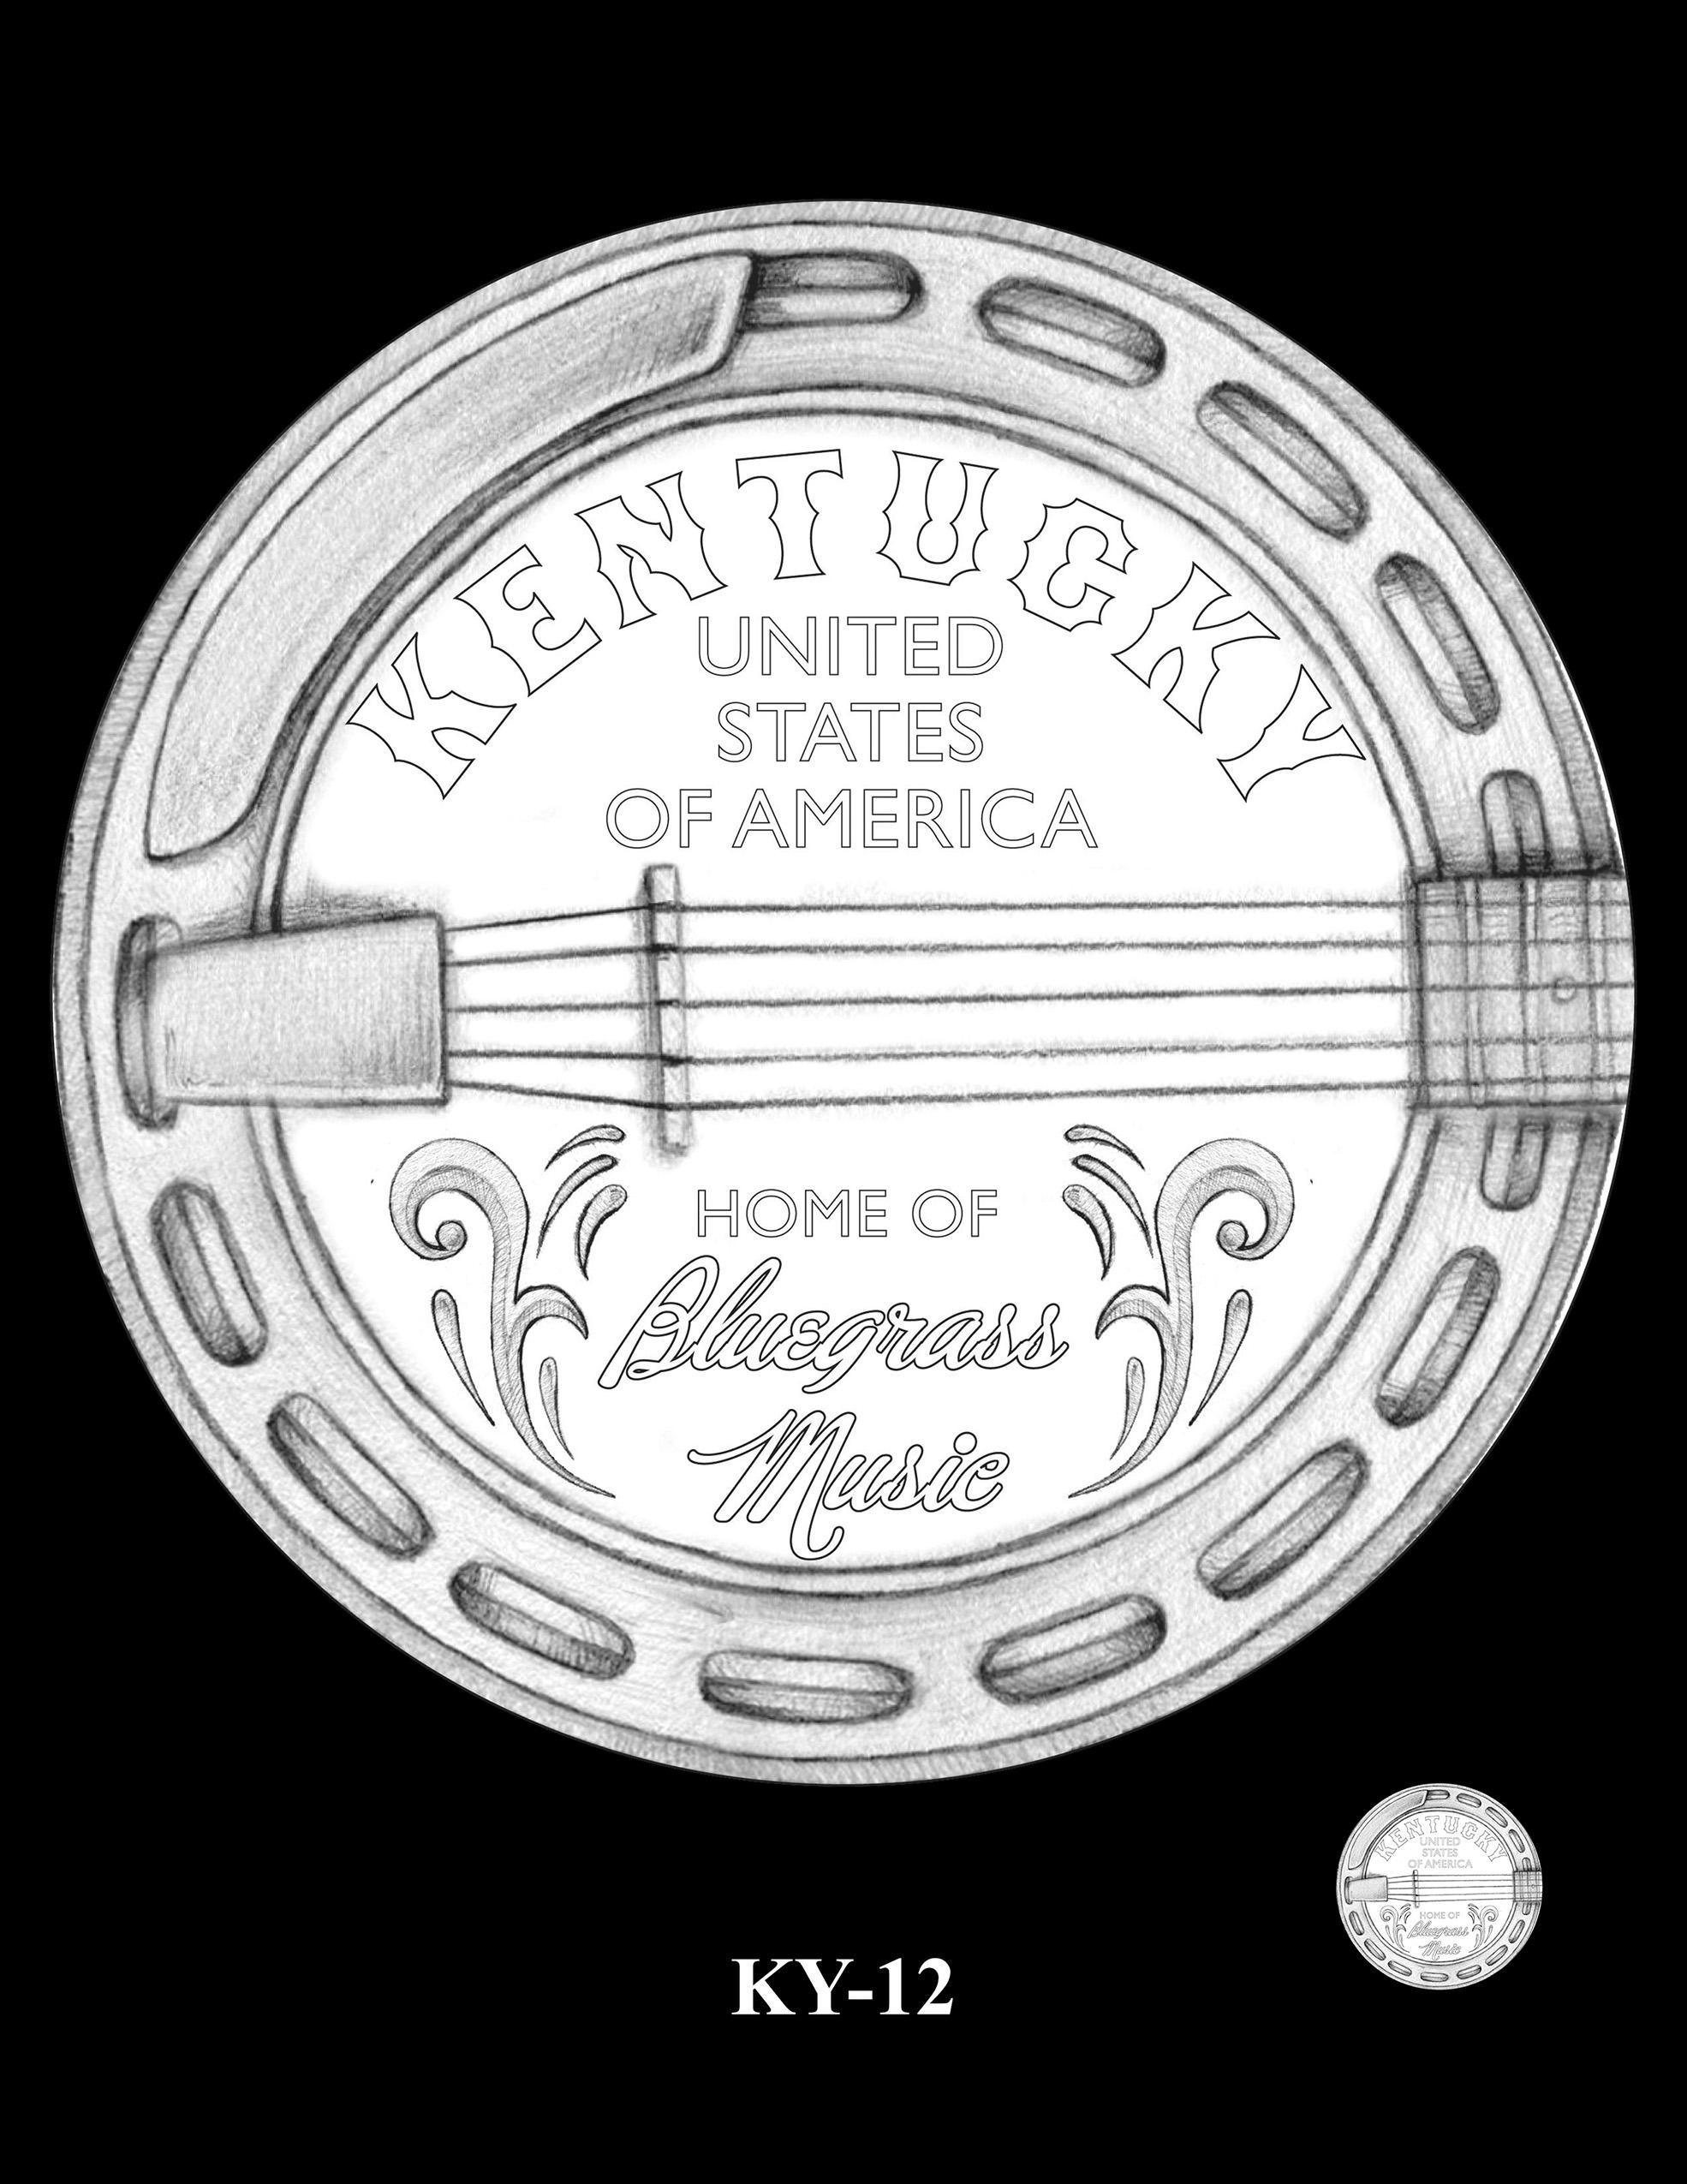 KY-12 -- 2022 American Innovation $1 Coin - Kentucky